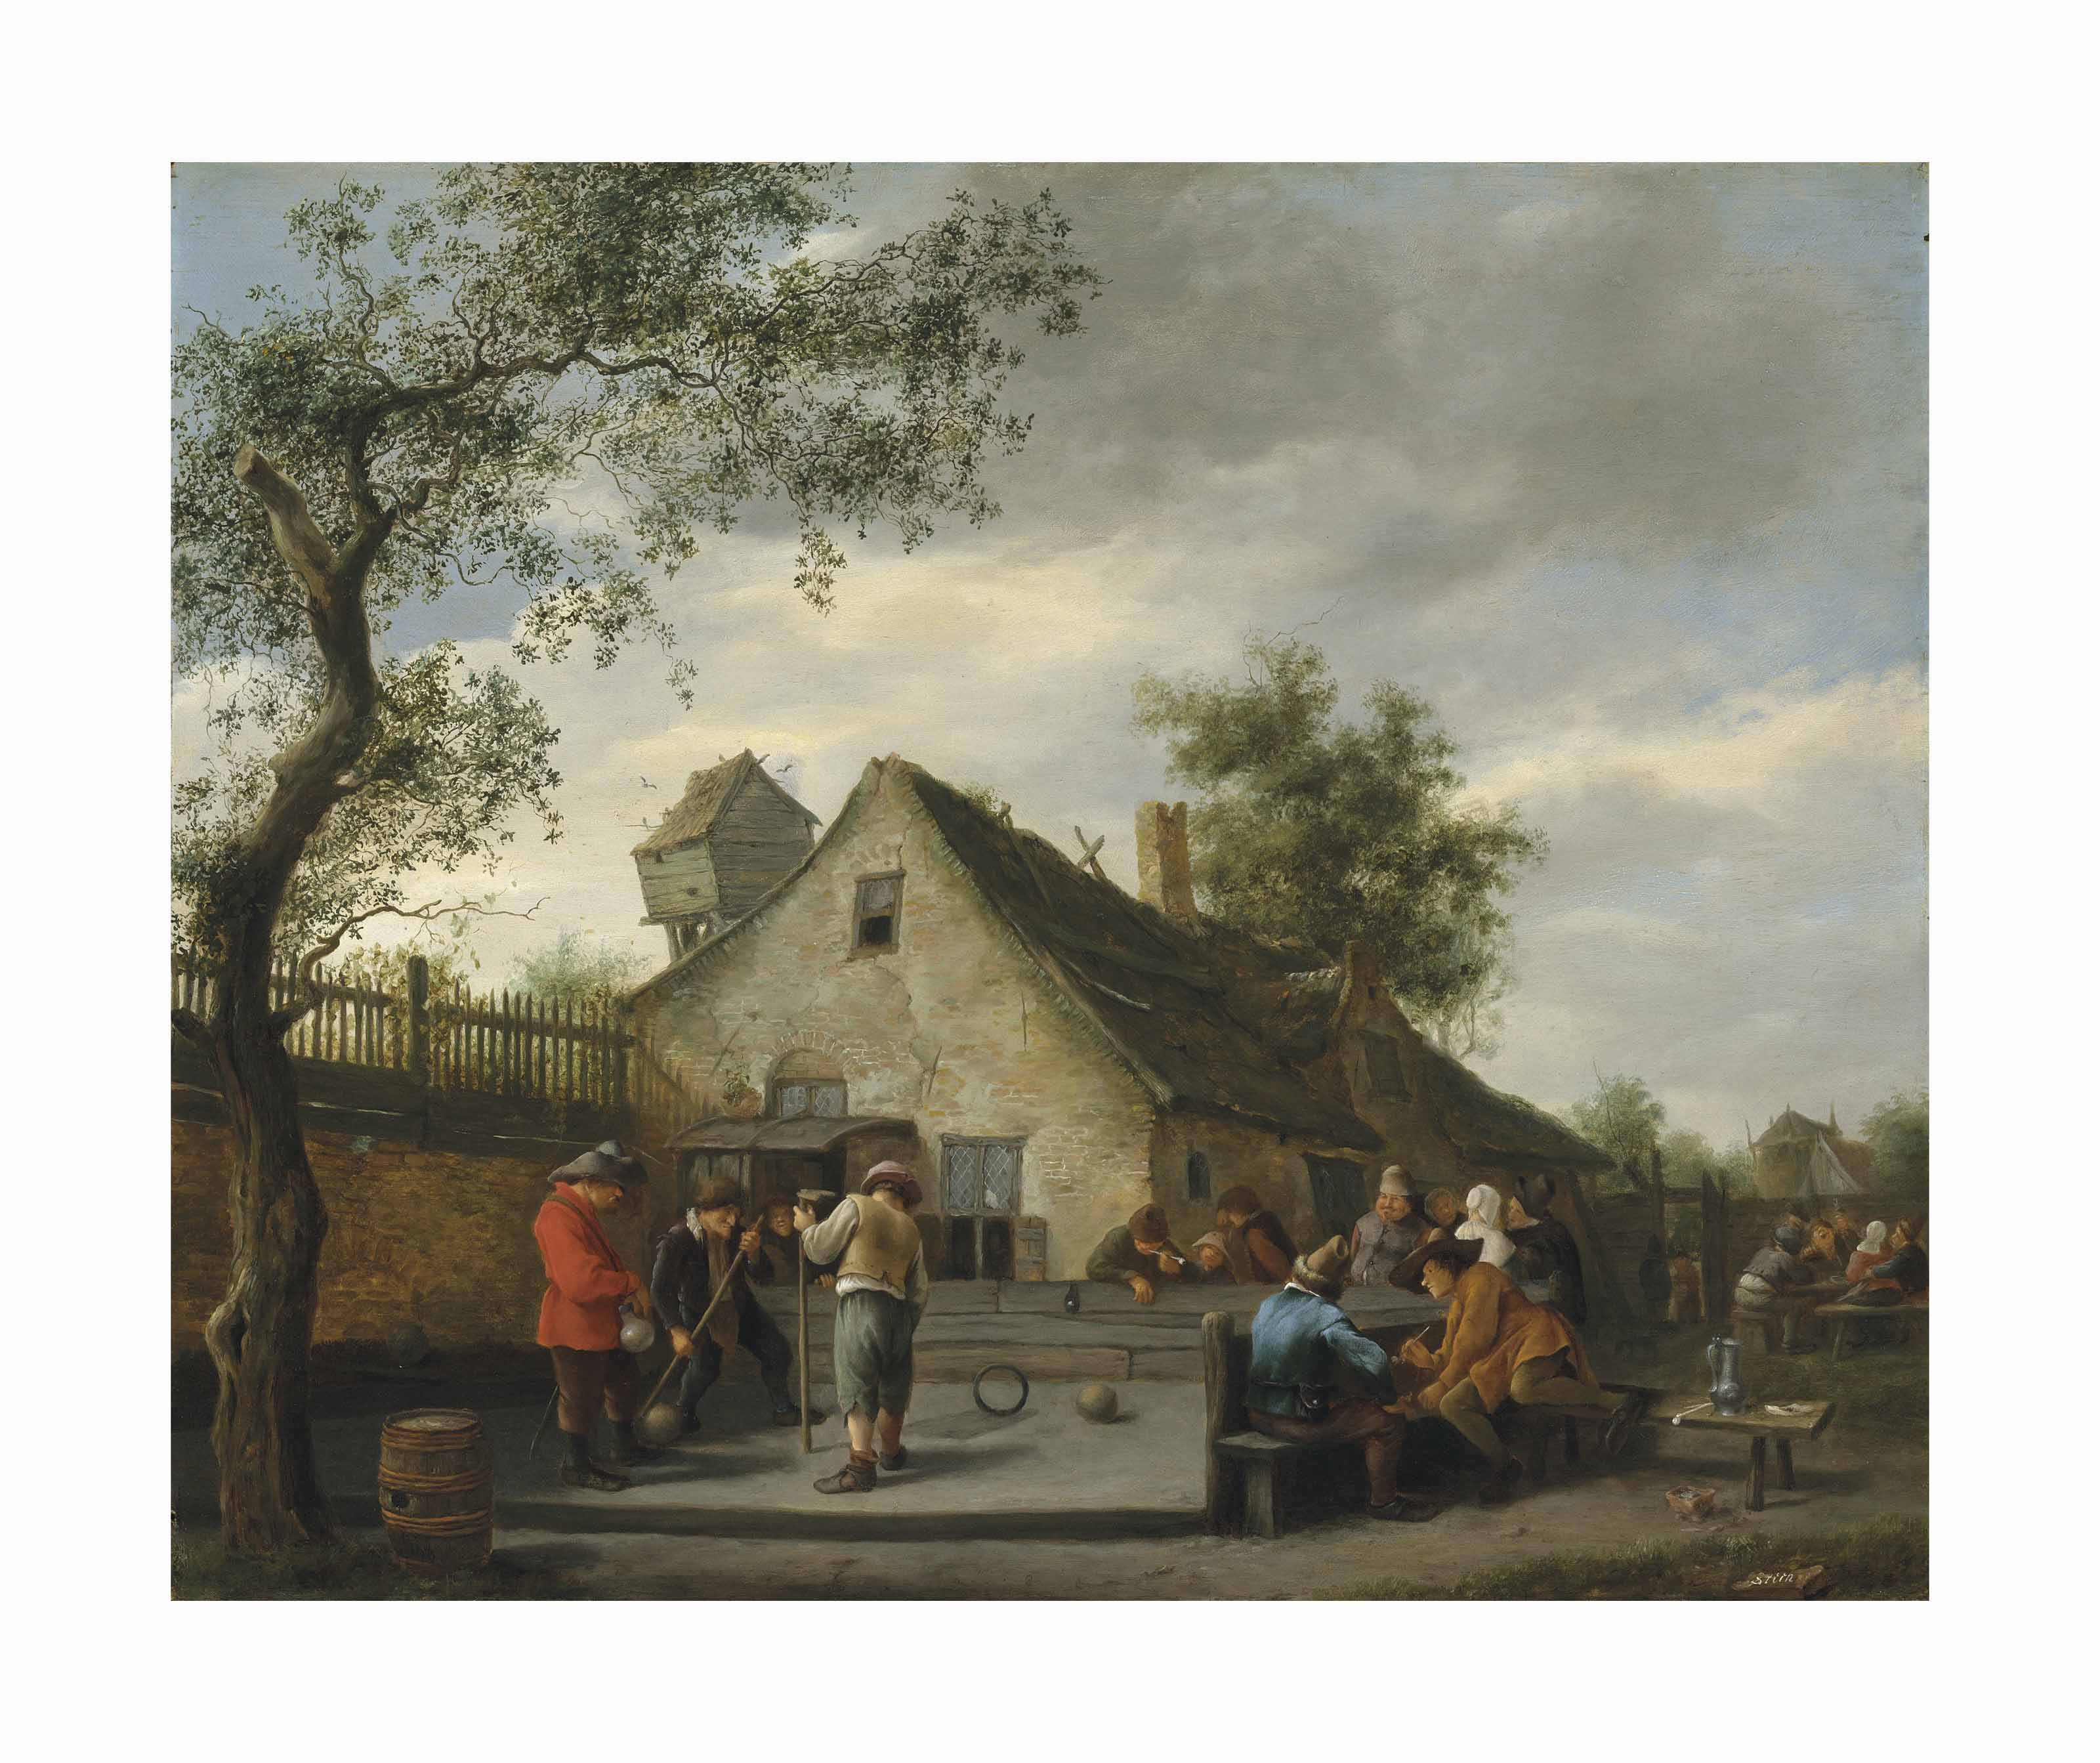 Jan Havicksz. Steen (Leiden 16